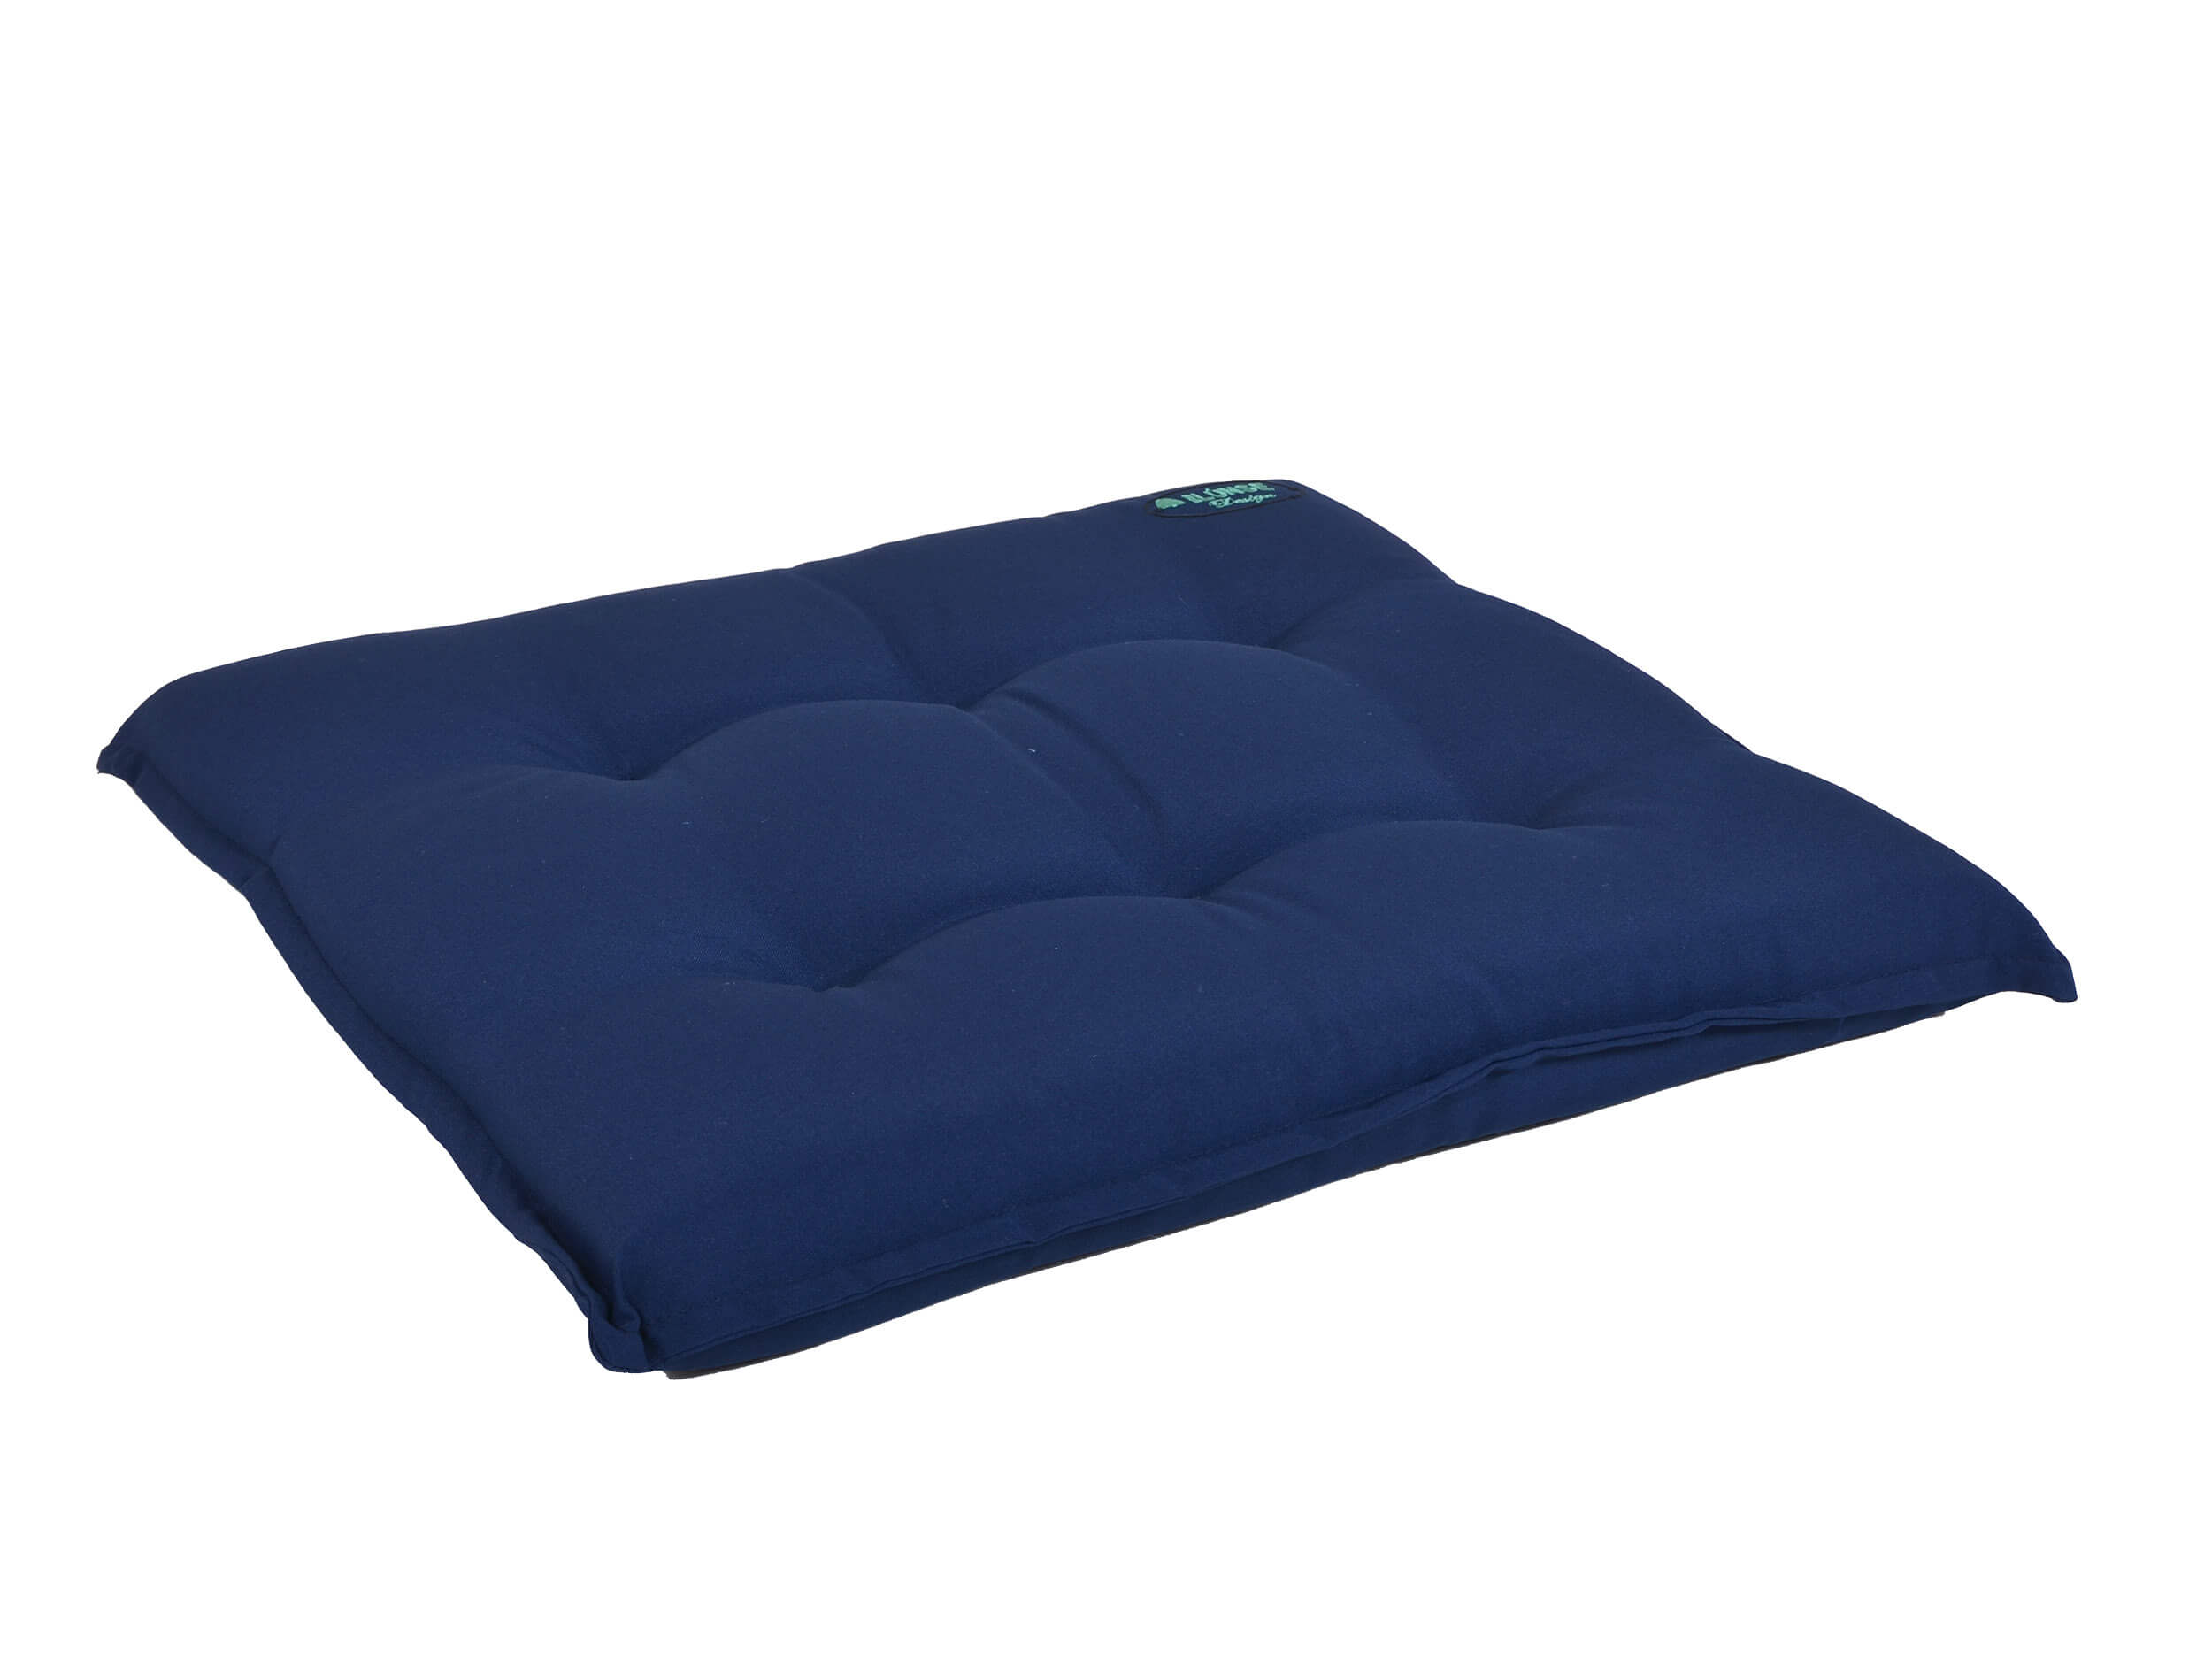 gartenstuhlkissen rechteckig 50x45cm blau gartenm bel l nse. Black Bedroom Furniture Sets. Home Design Ideas